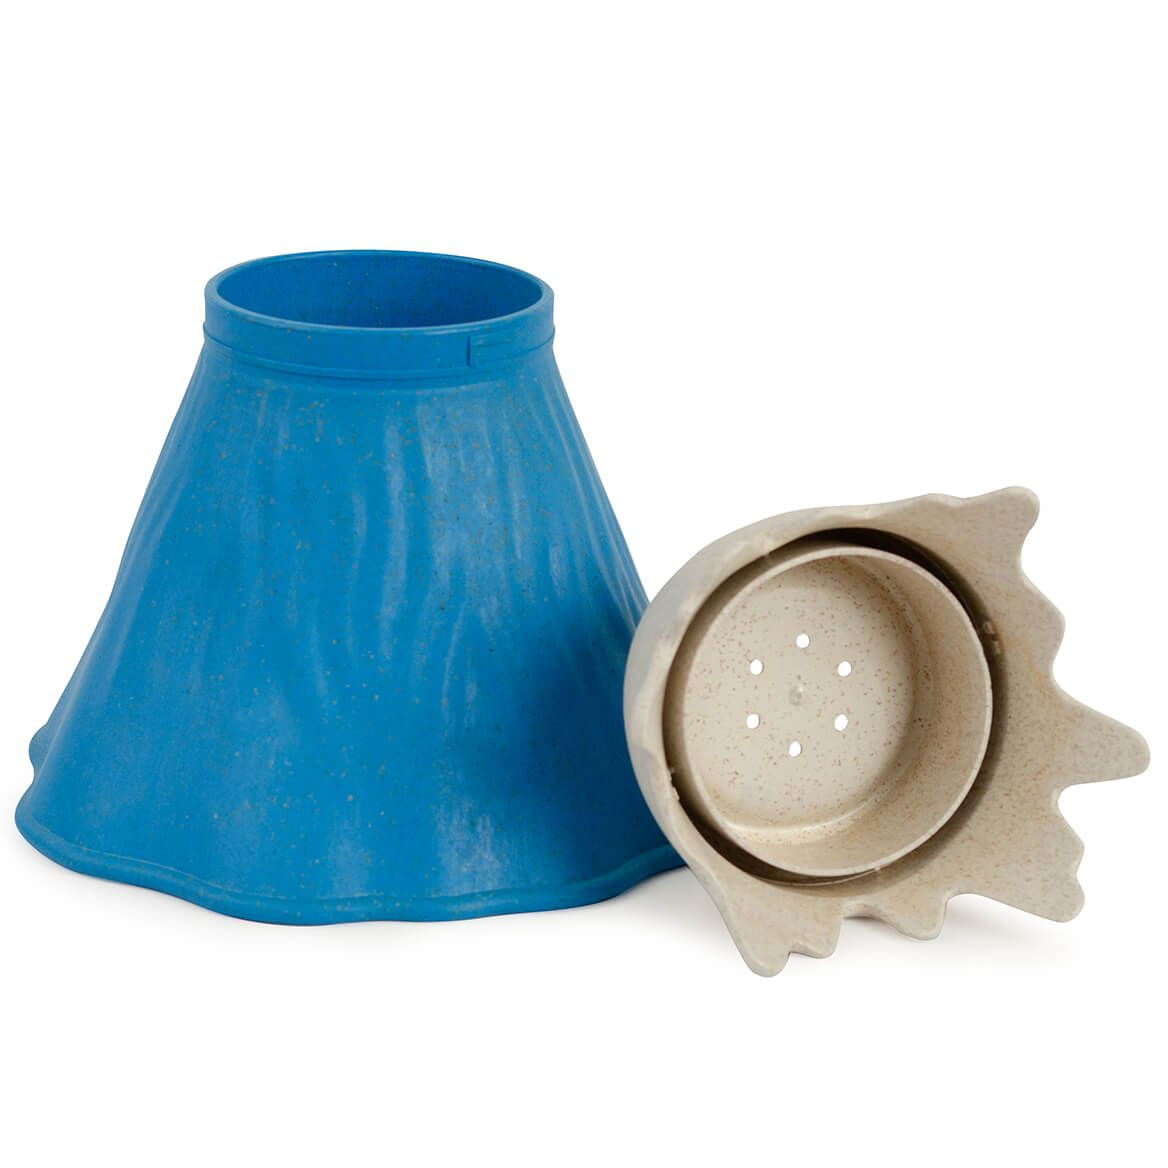 Eco Volcano Microwave Cleaner-372018